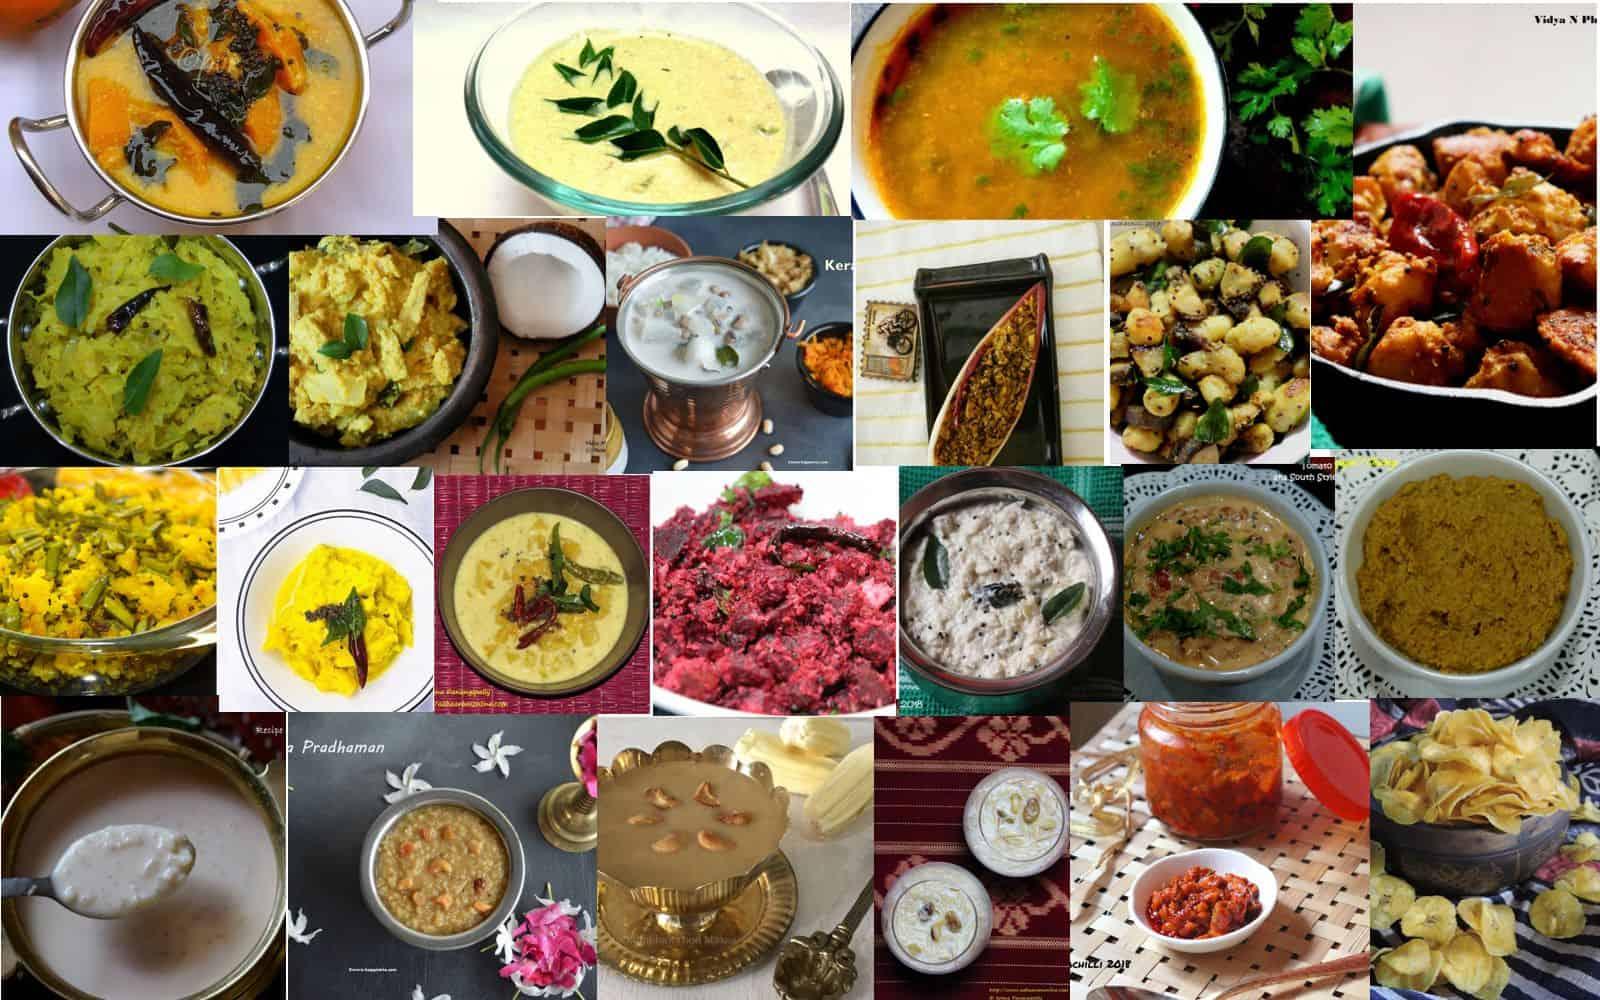 Vishu (Significance and Recipes)